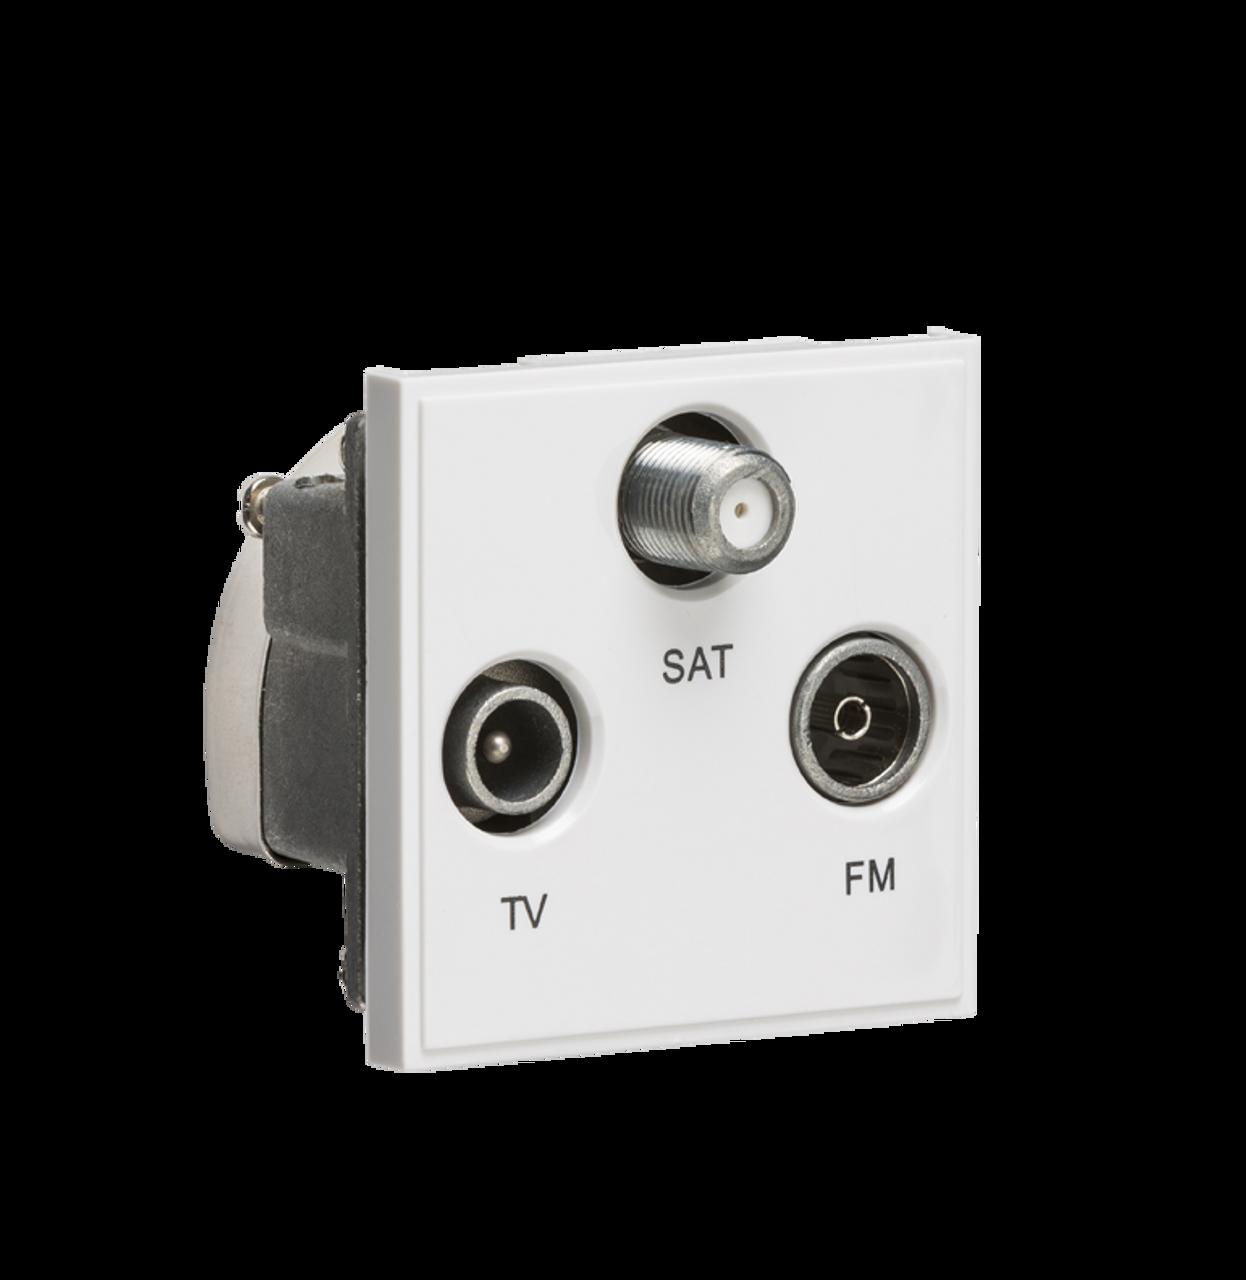 White Modular Triplexed TV /FM DAB/ SAT TV Outlet (DFL1NETTRIWH)